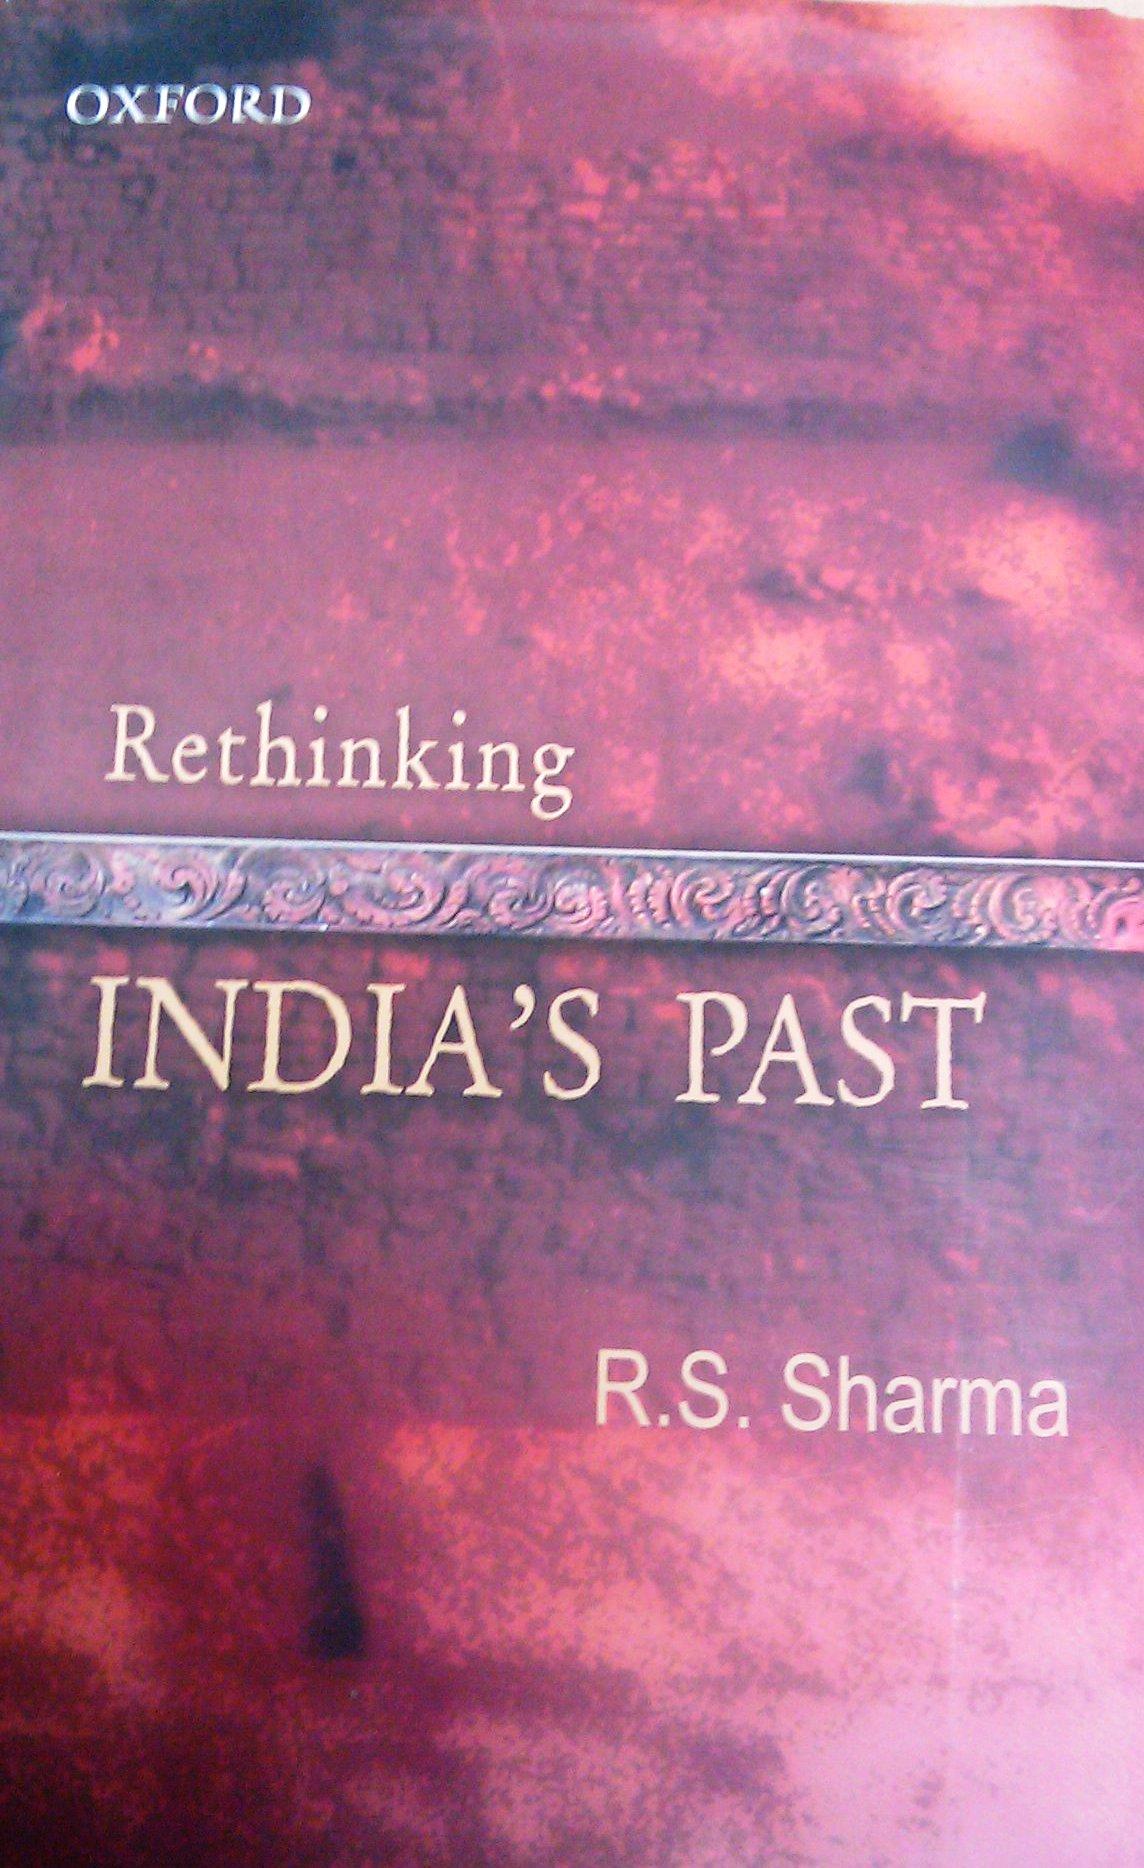 Rethinking India's Past – R.S. Sharma ; చదవదగ్గ చరిత్ర పుస్తకం